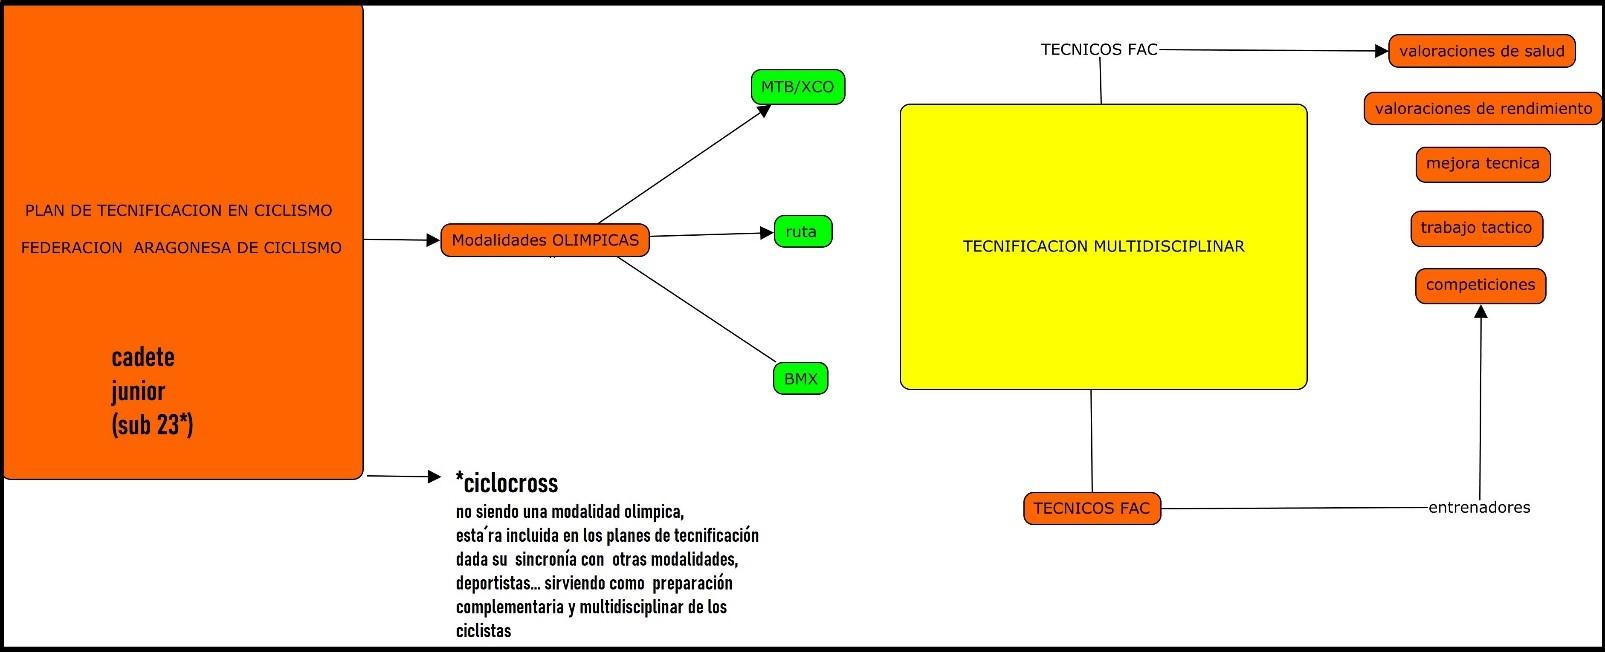 Plan de Tecnificación